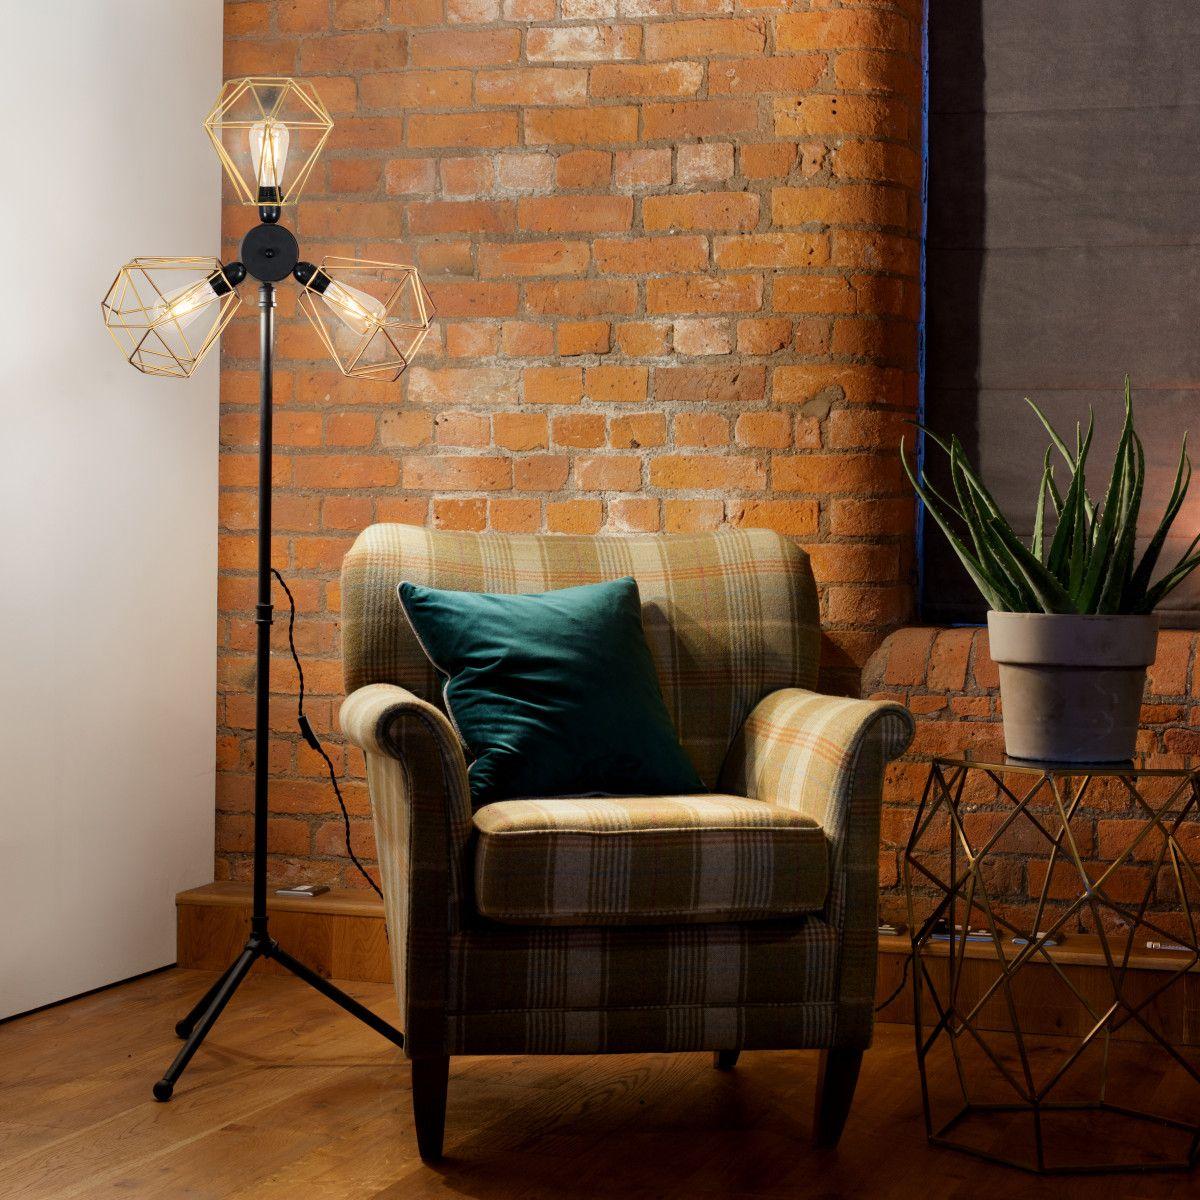 Irwin Steampunk 3 Way Floor Lamp With Gold Diablo Shades